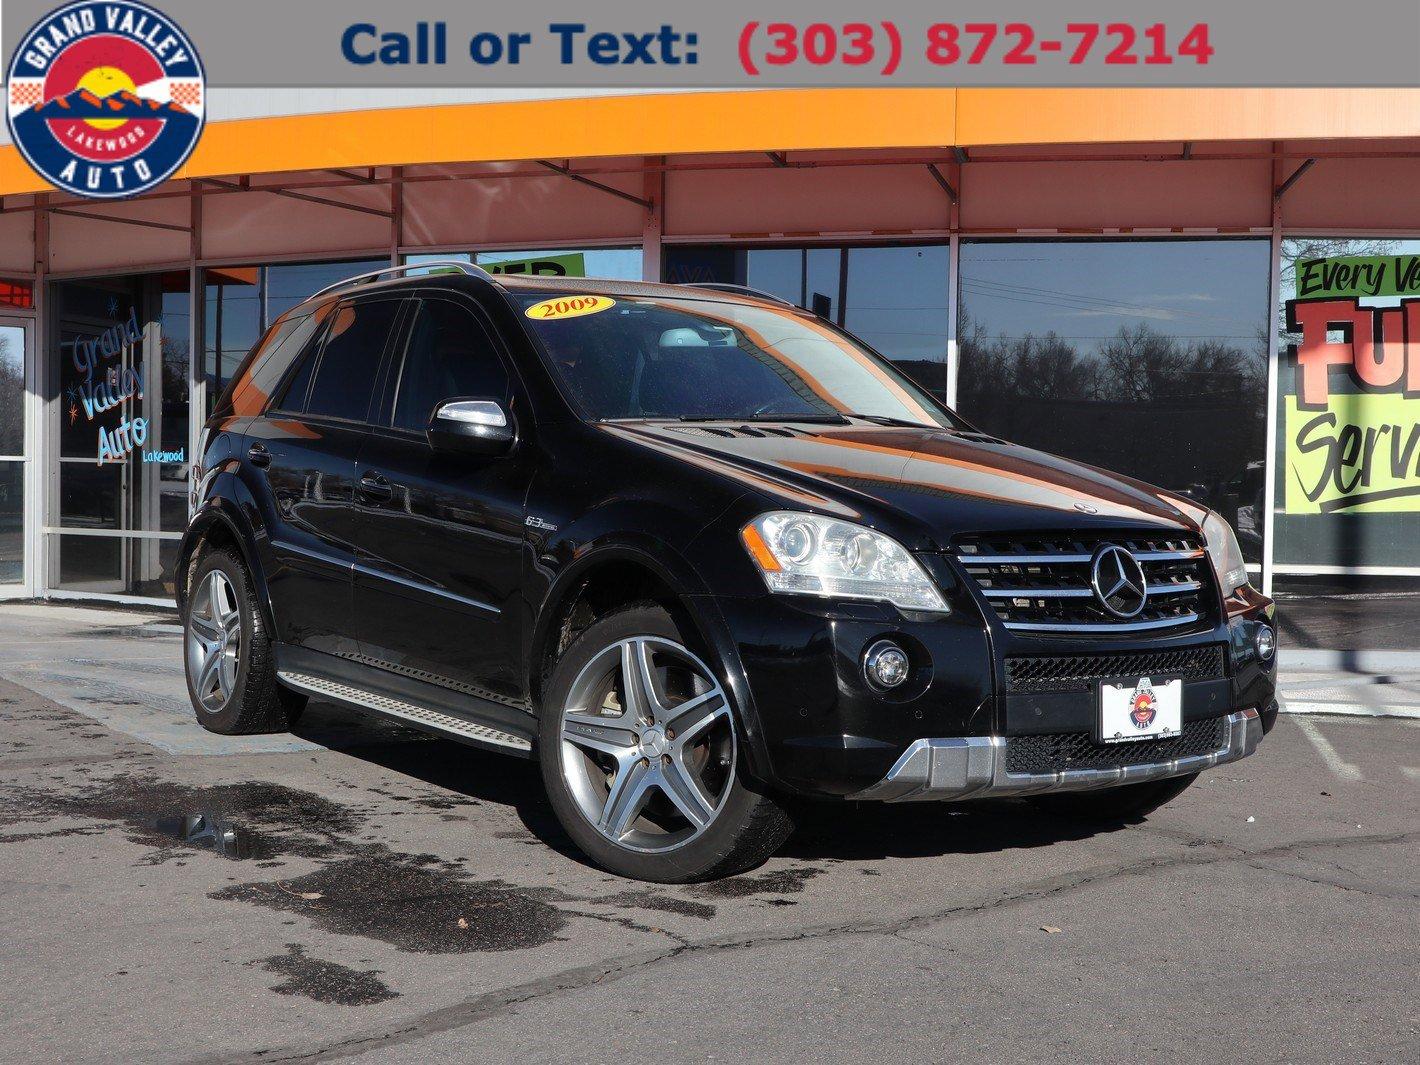 2009 Mercedes-Benz ML 63 AMG 4MATIC image